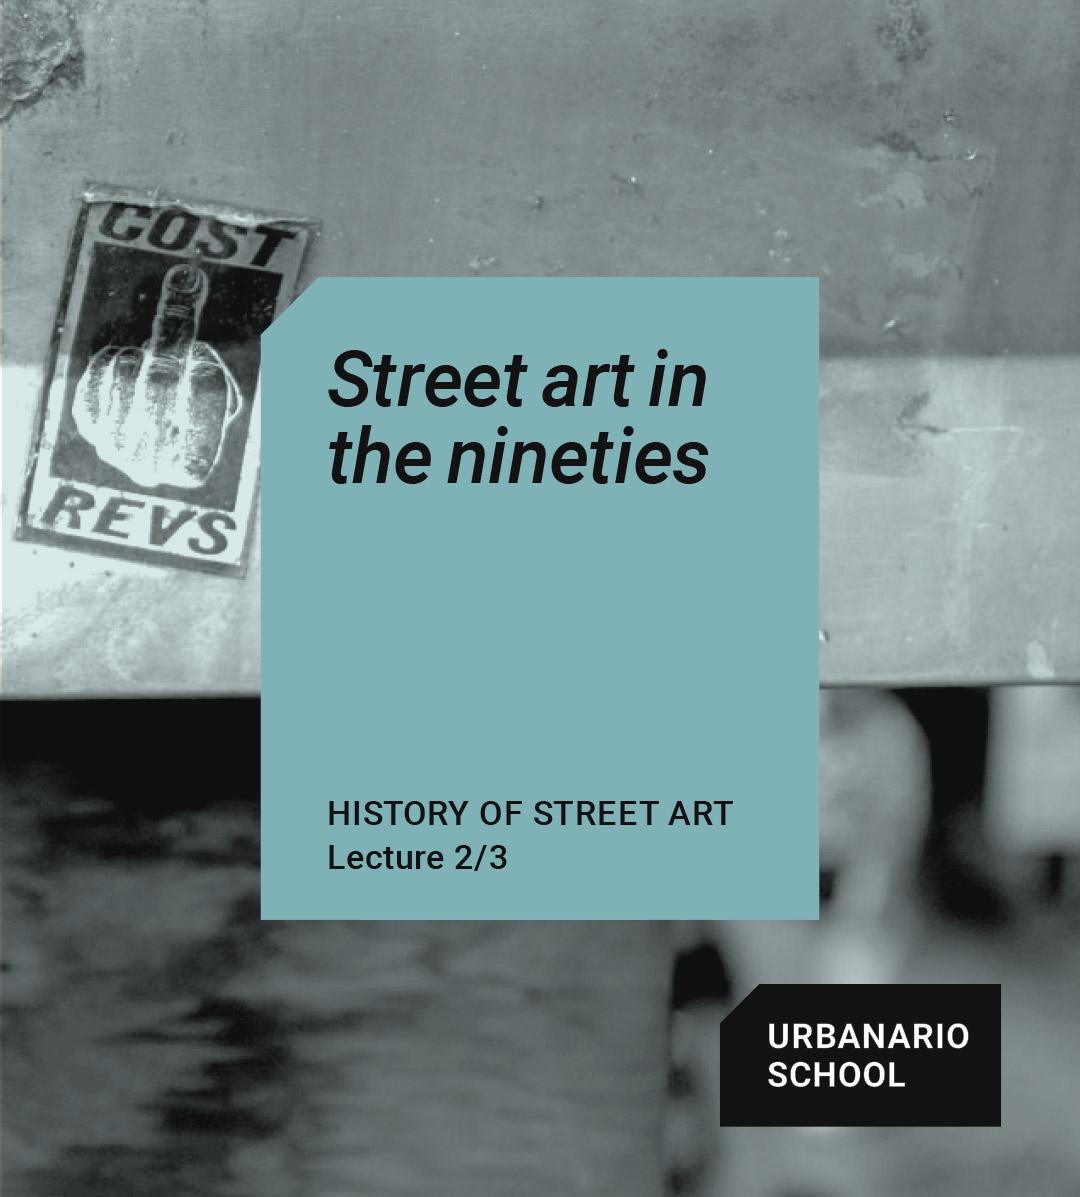 Street art in the nineties - Urbanario School